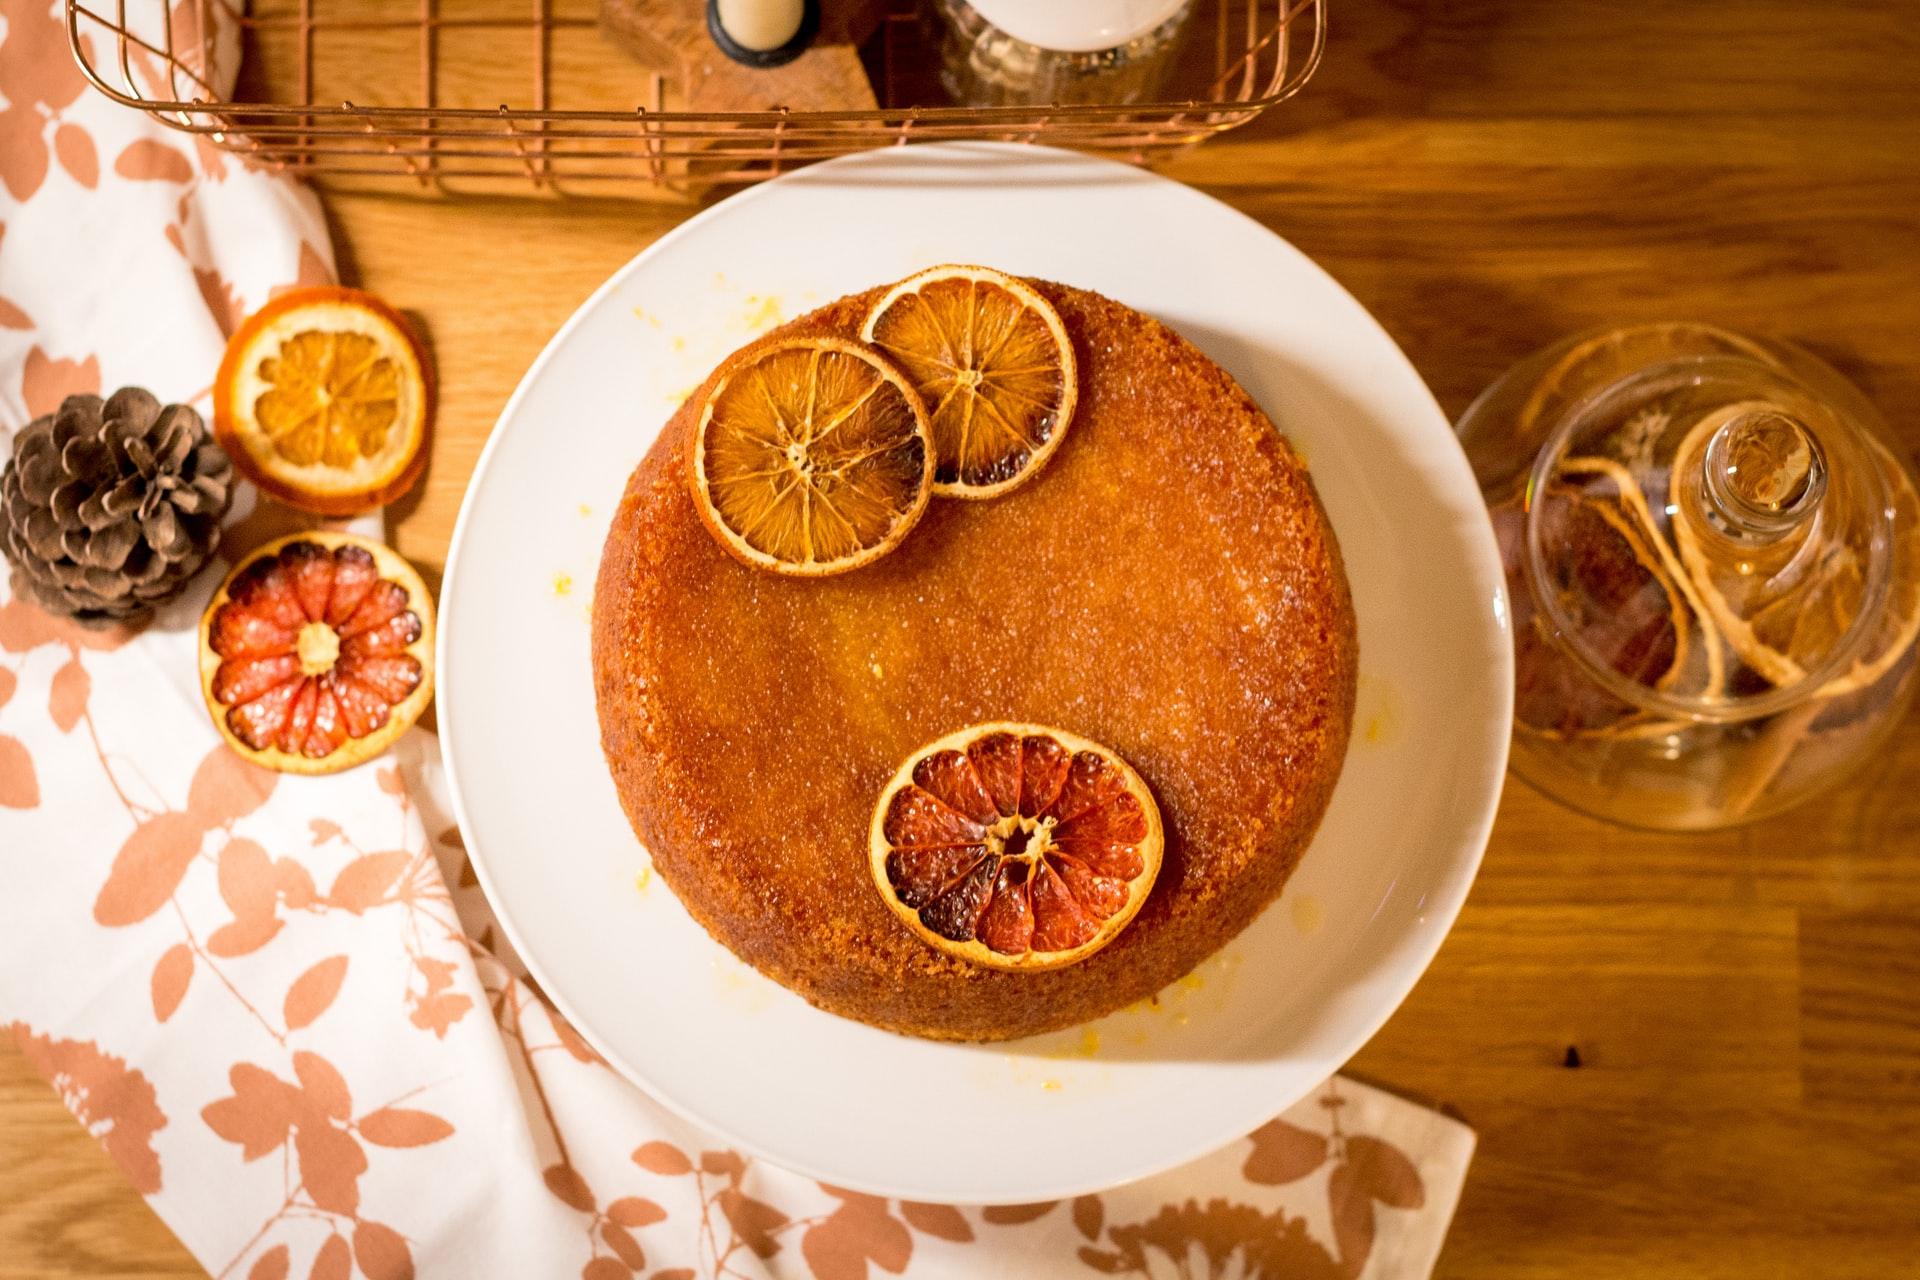 Torta all'olio d'oliva all'arancia